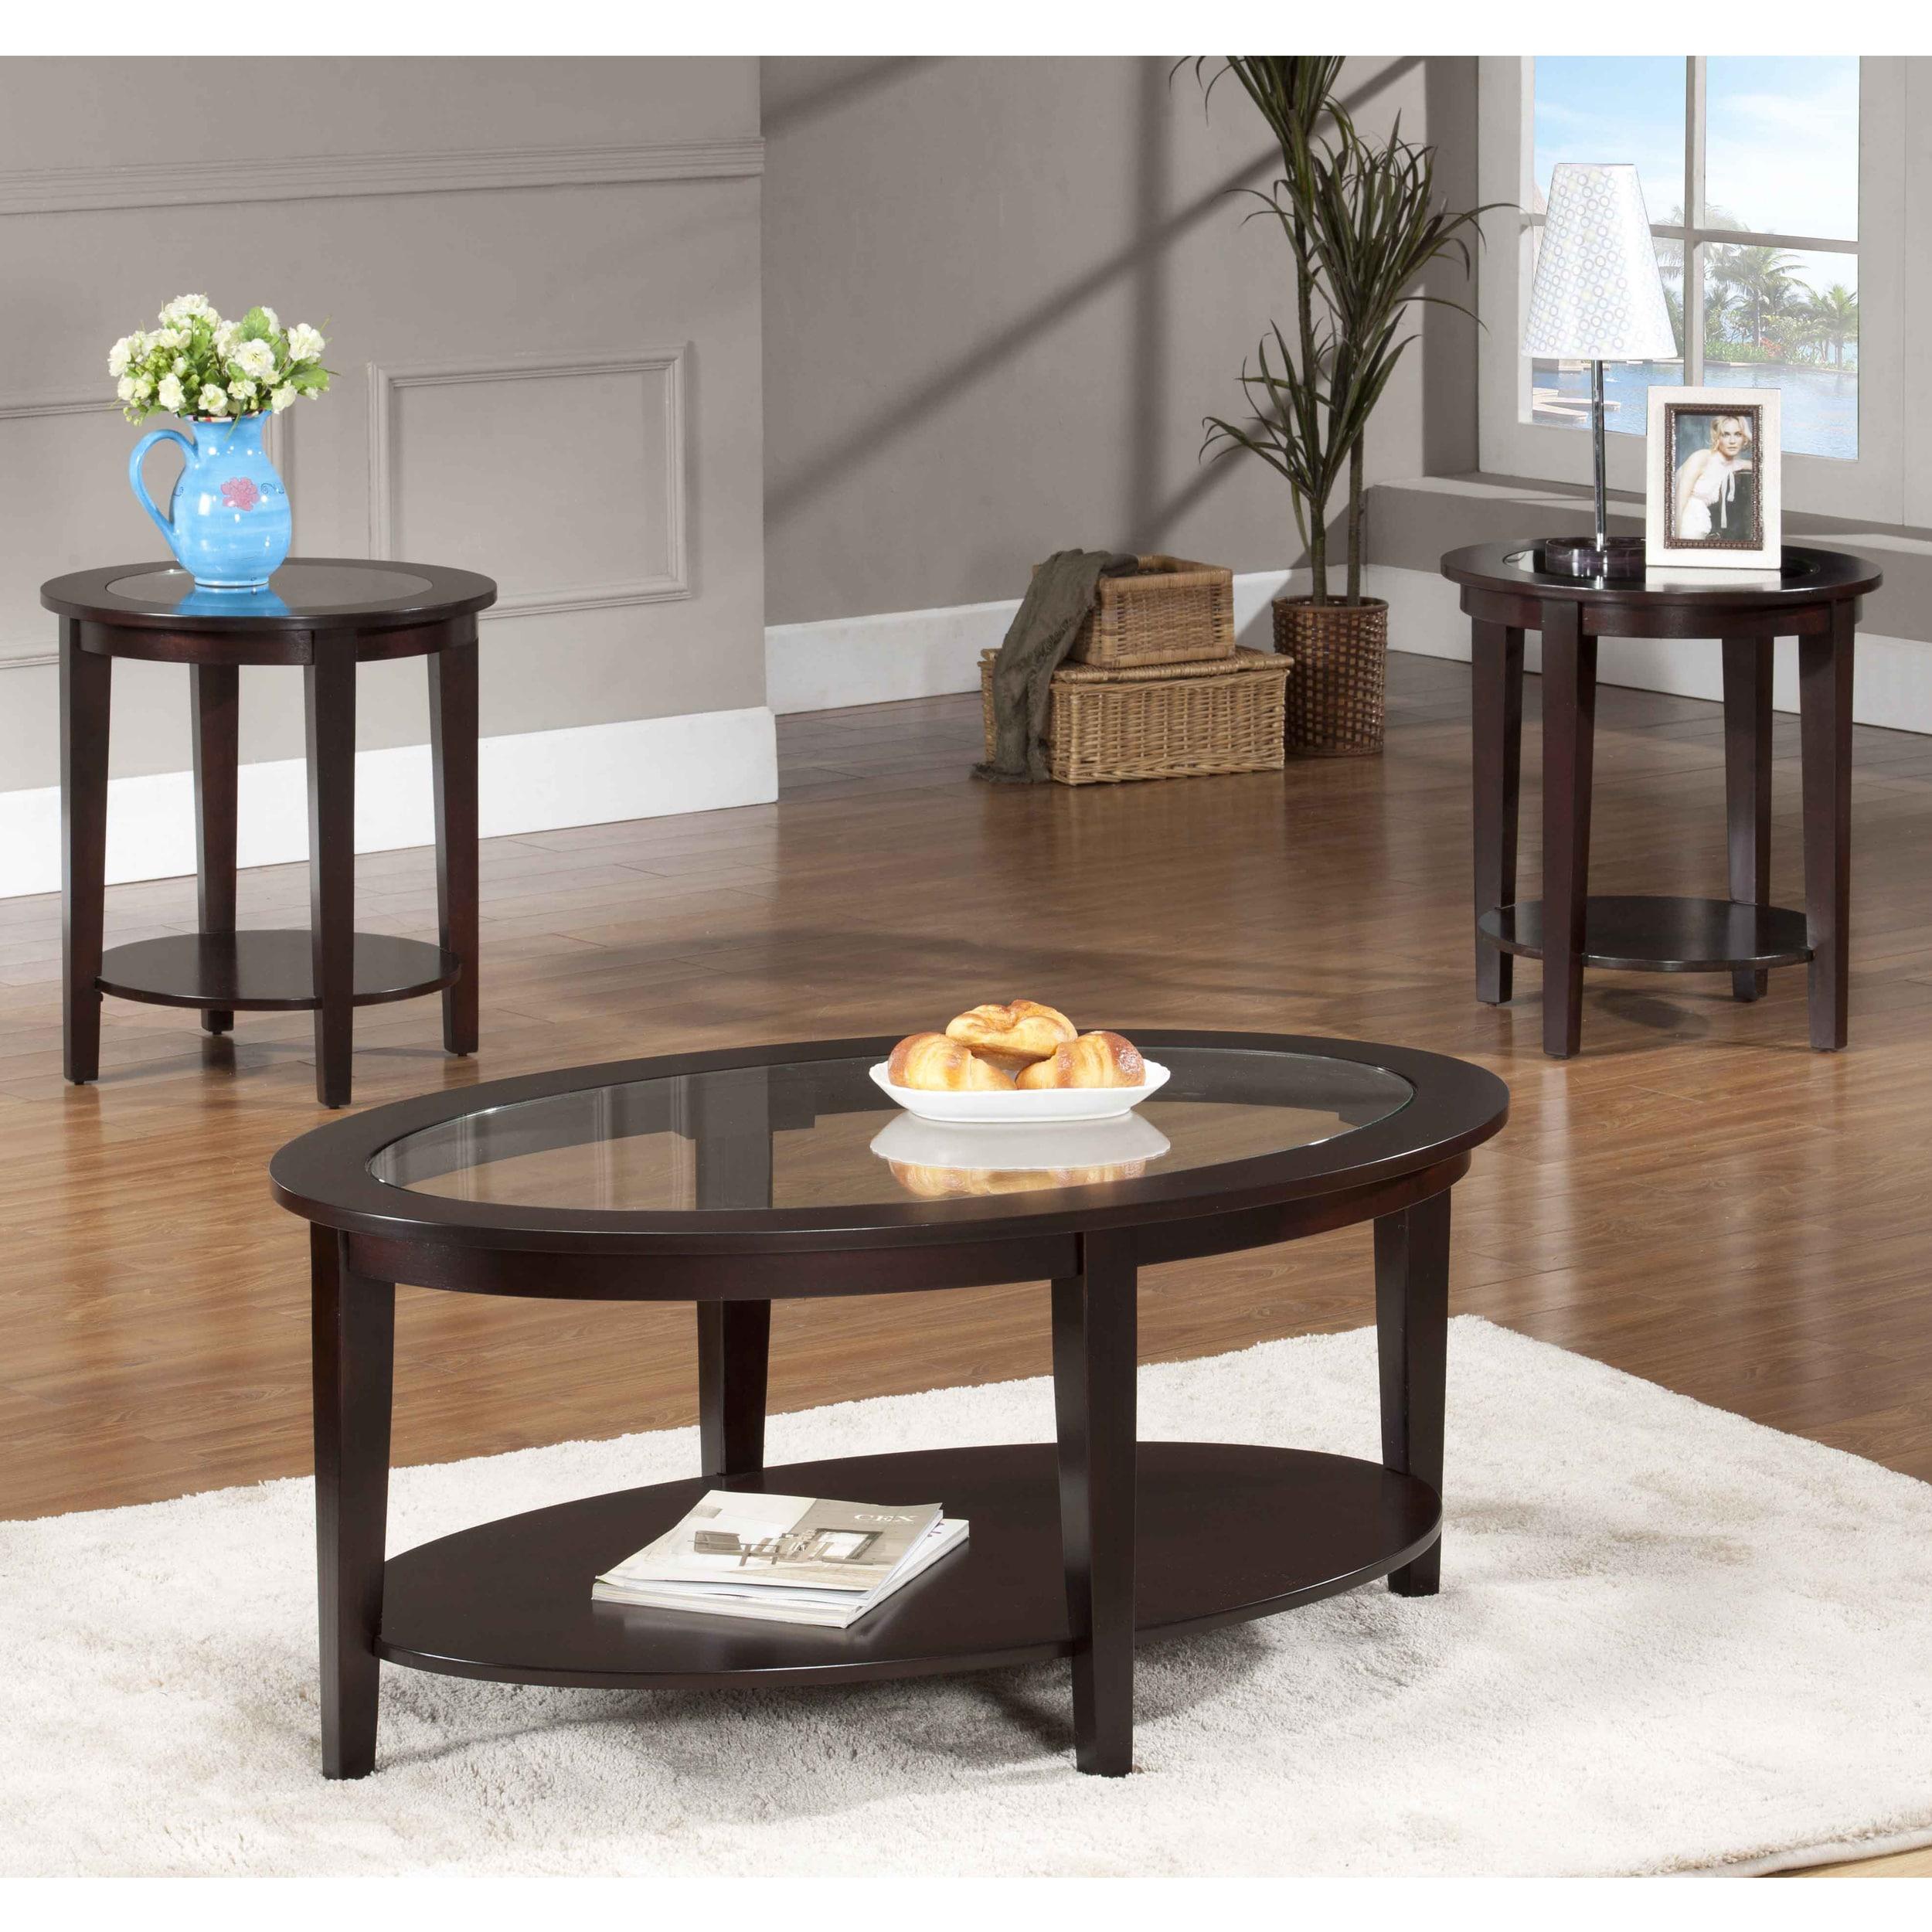 Oval Glass Coffee Table 3-piece Set